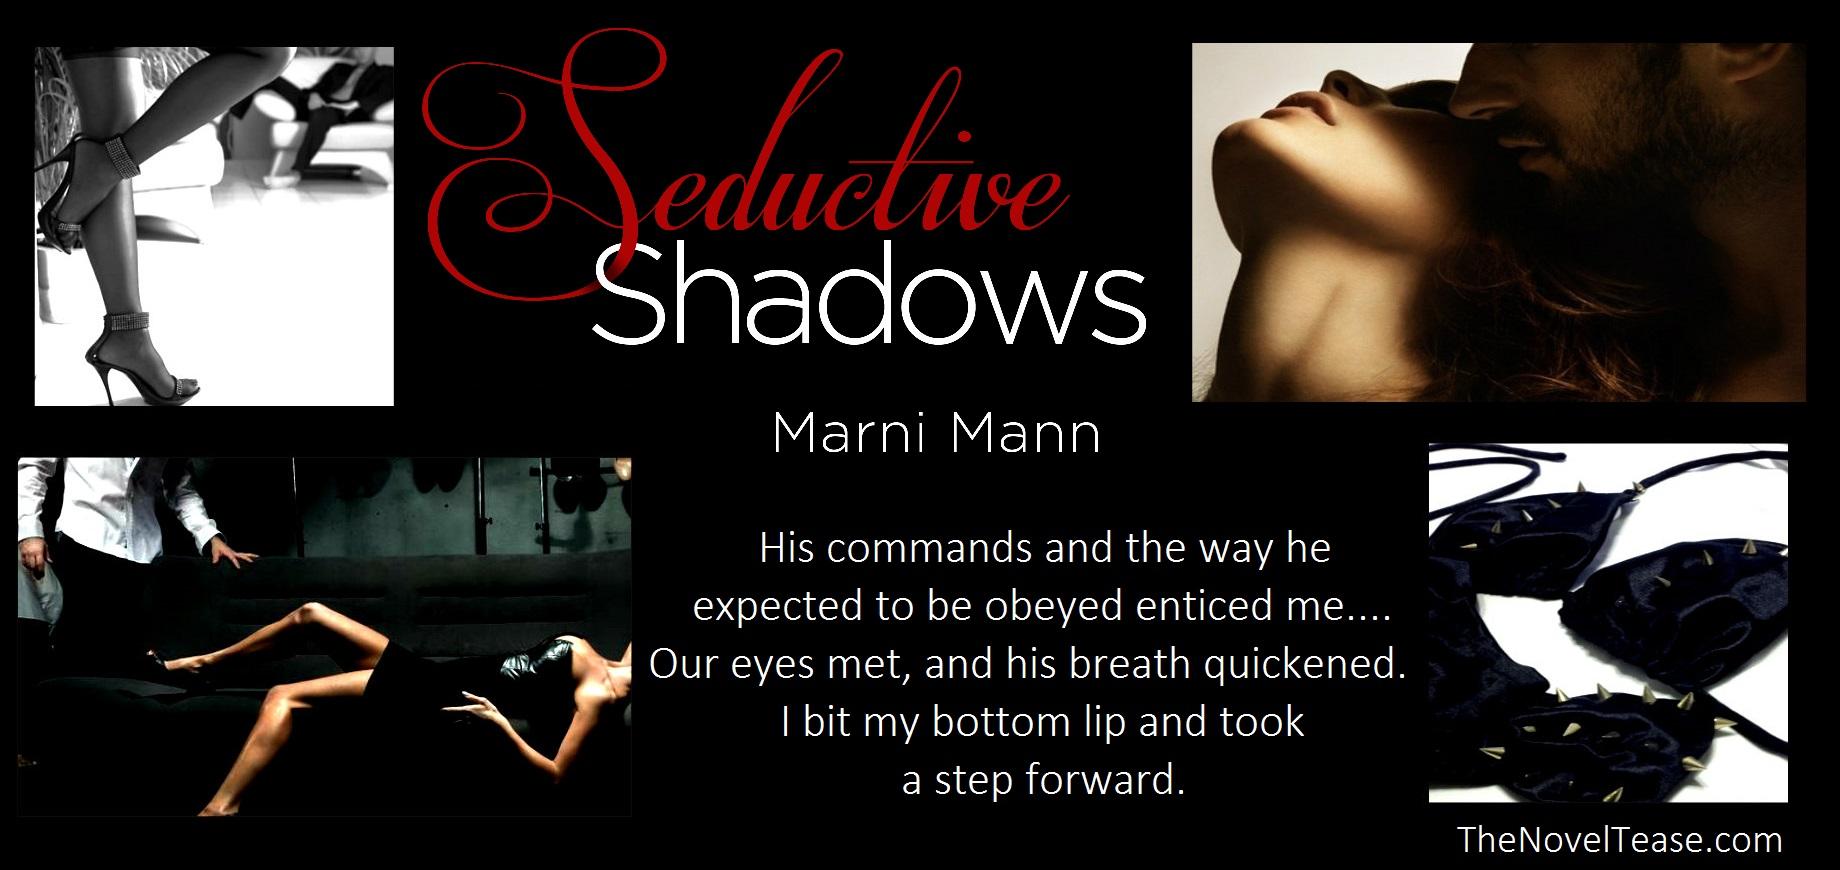 Seductive Shadows Promo Pic 1